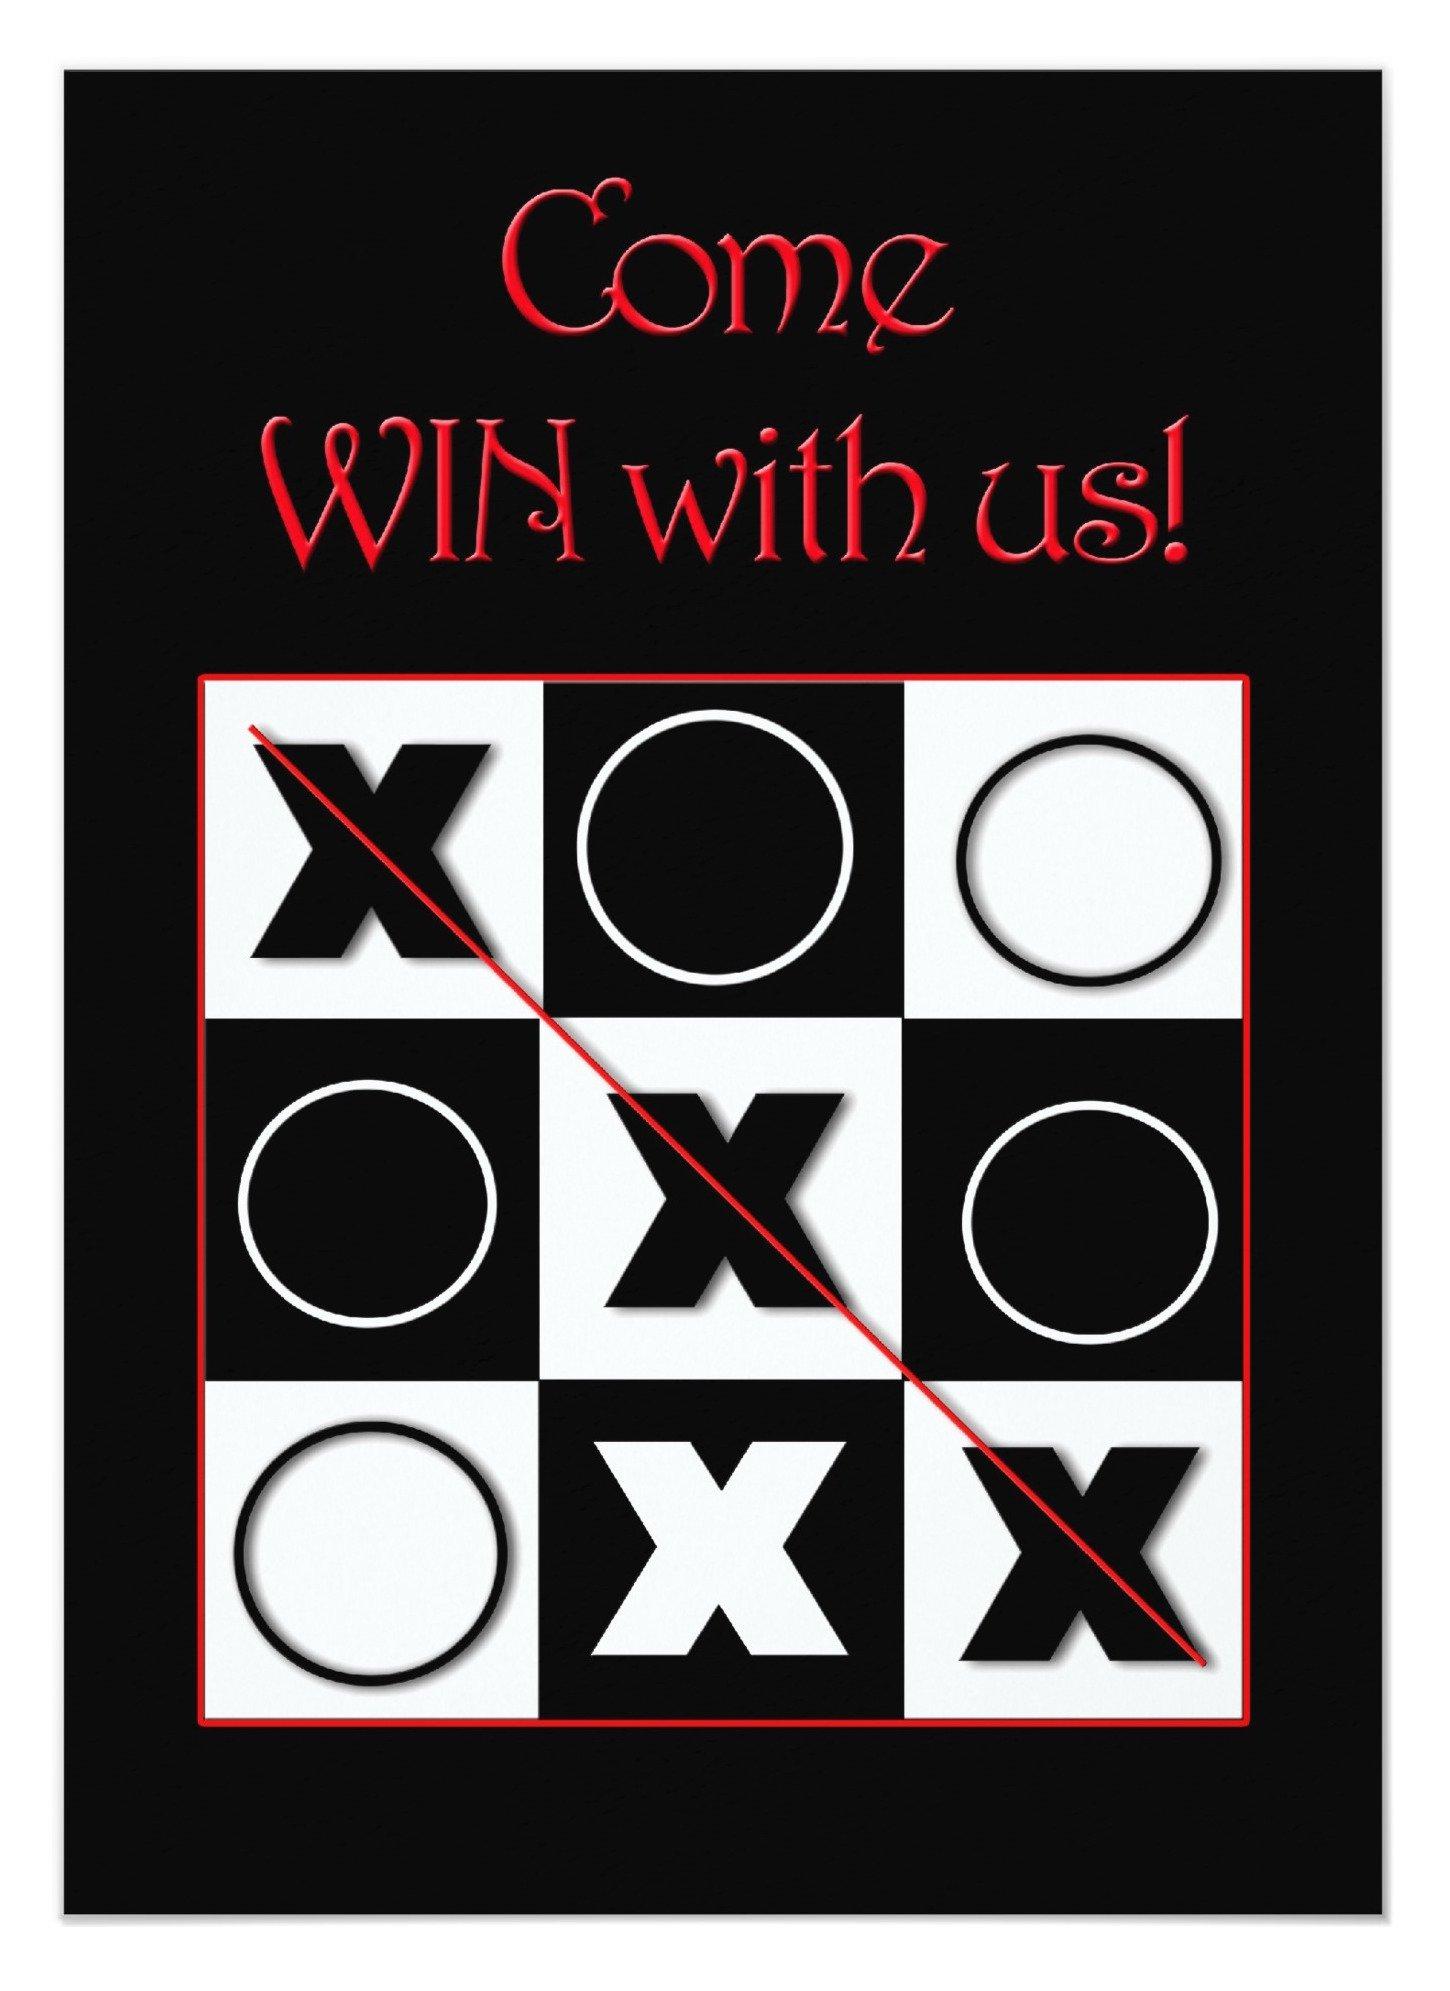 Win with us invitation